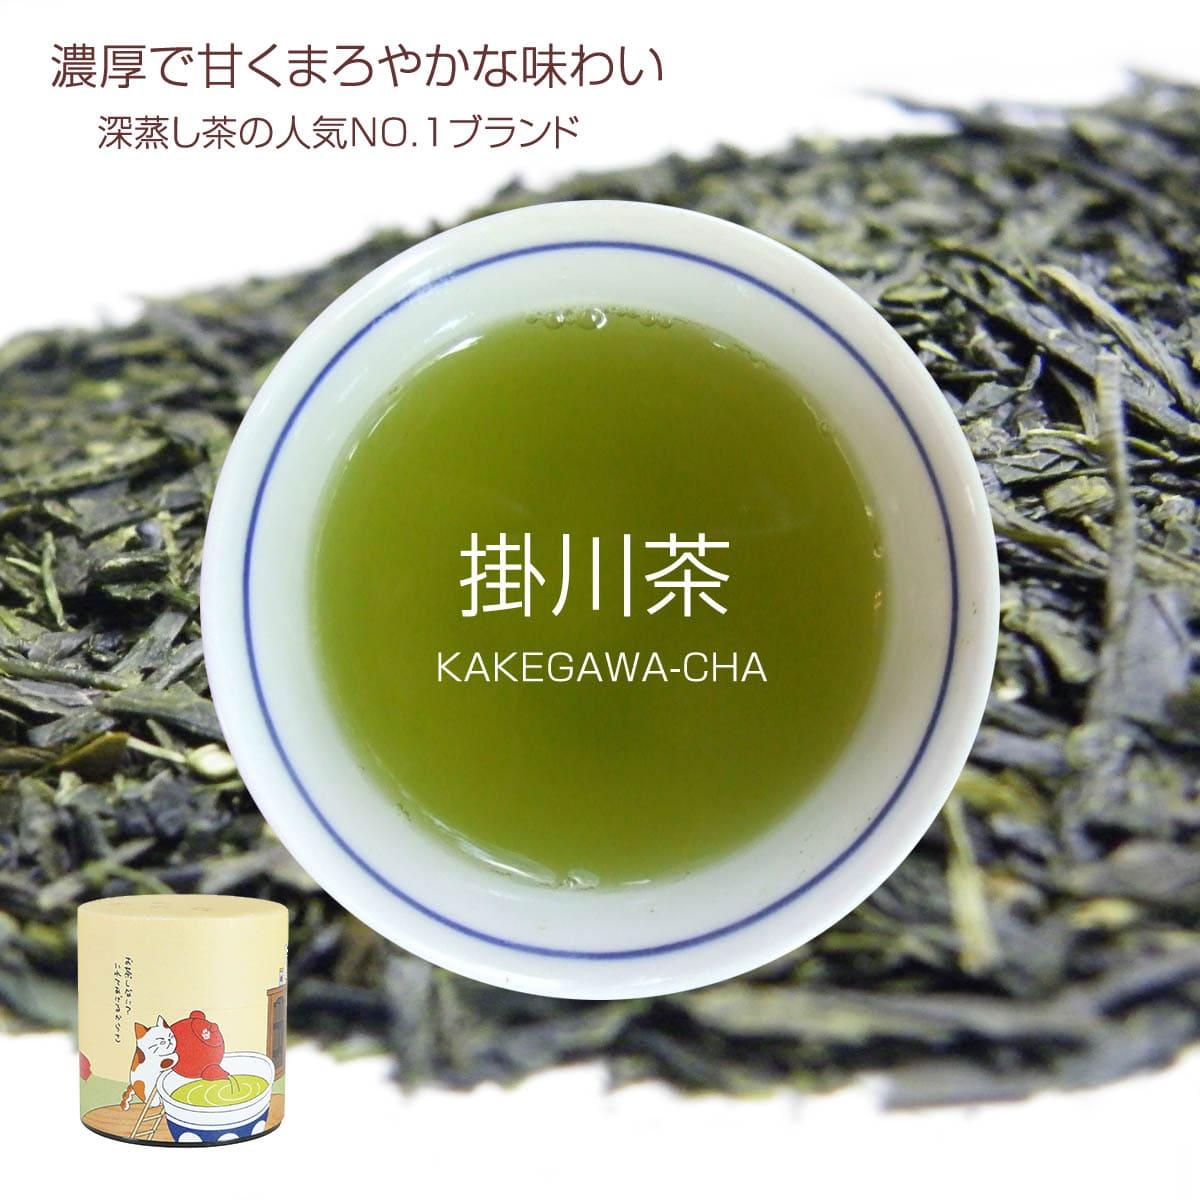 掛川産 掛川茶 深蒸し茶(80g)